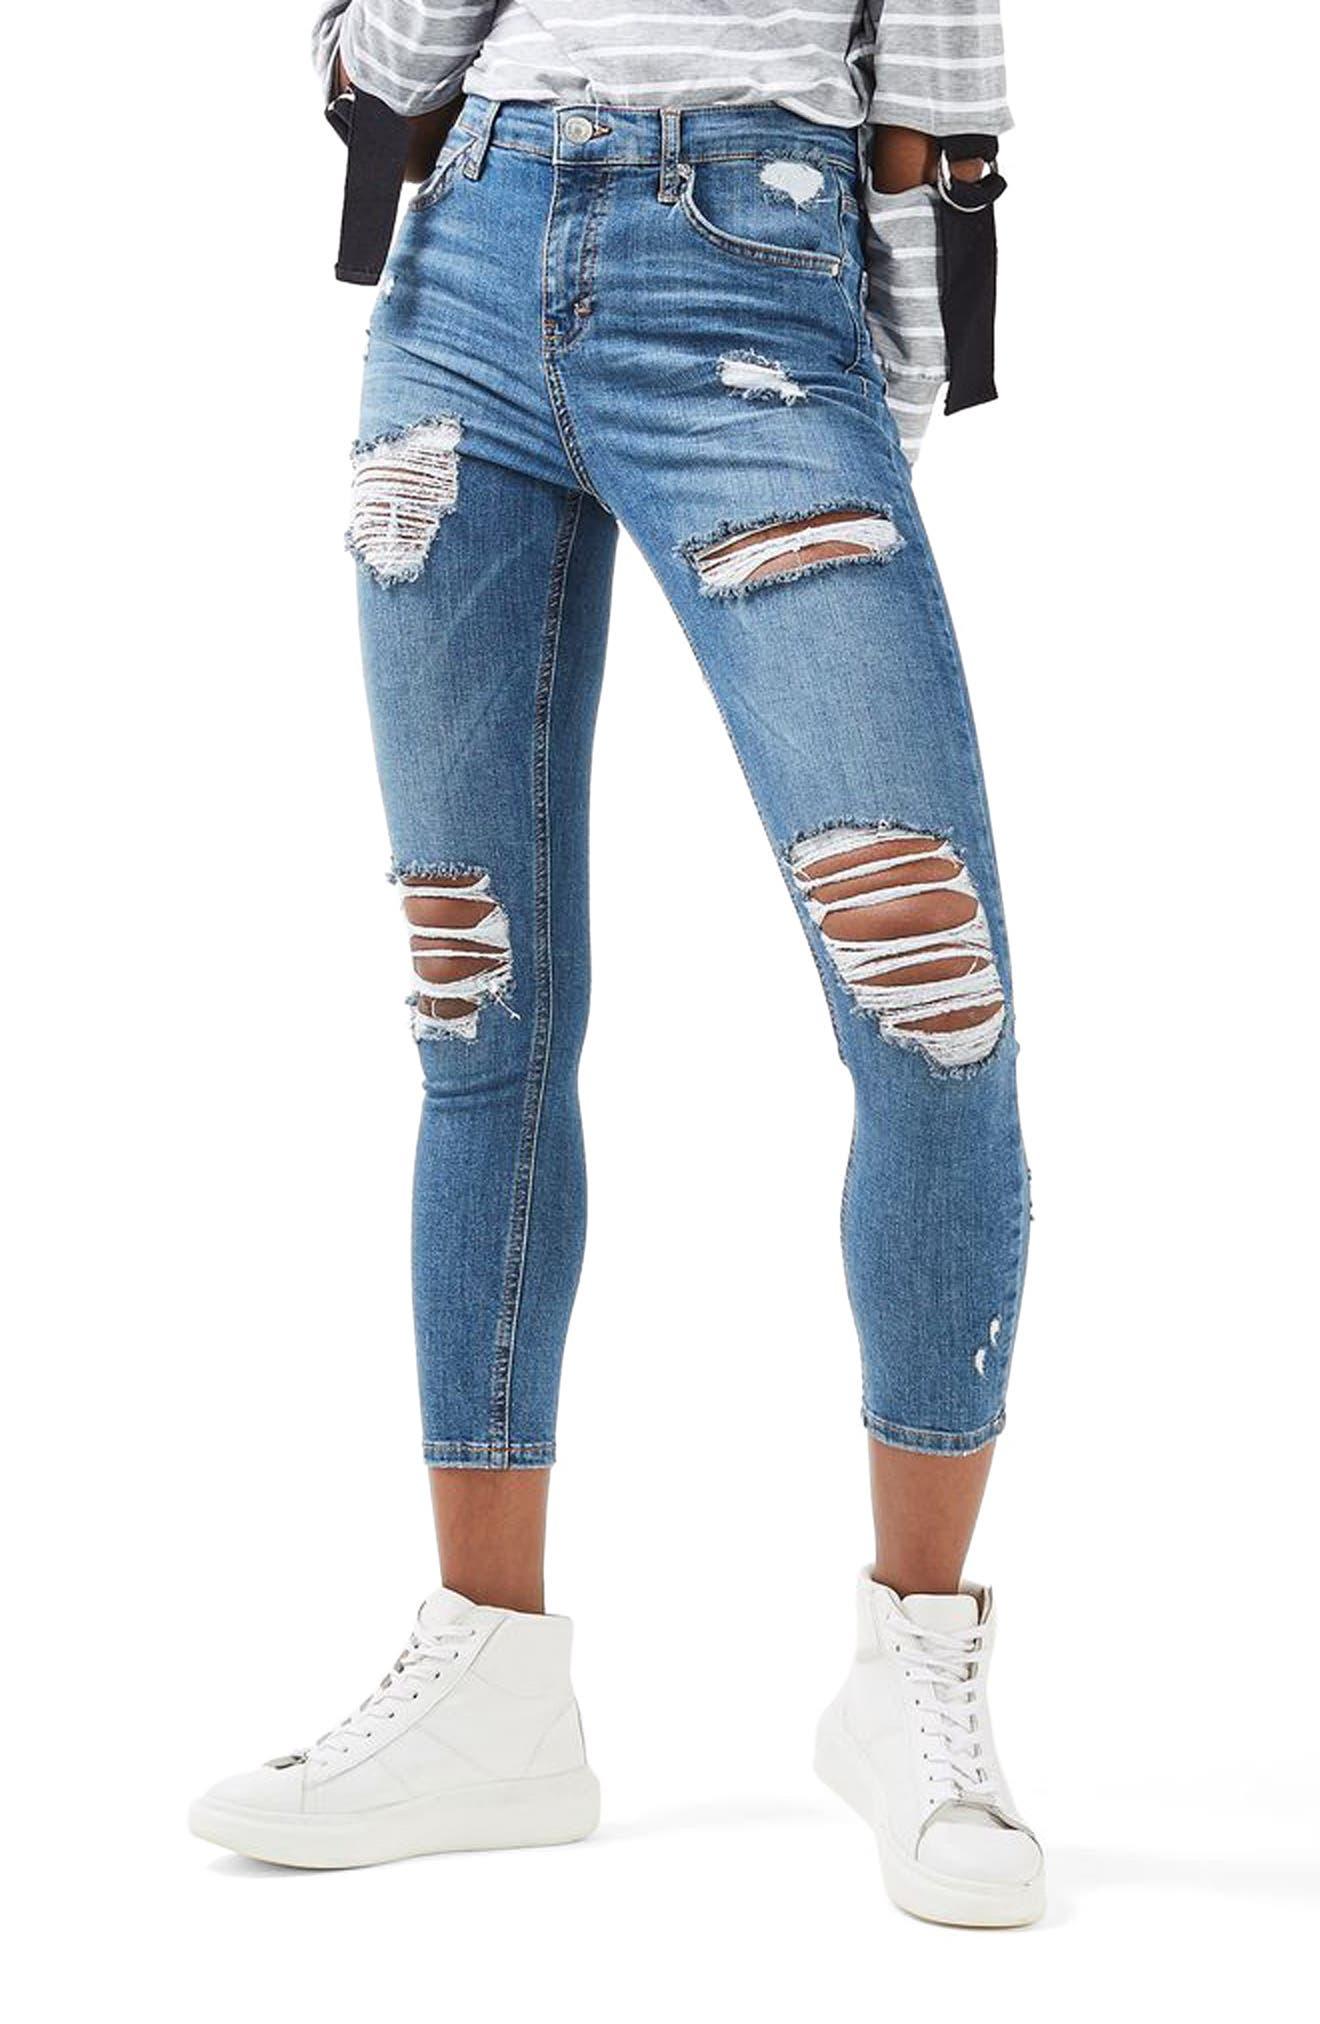 Alternate Image 1 Selected - Topshop Moto Jamie Super Rip Skinny Jeans (Petite)